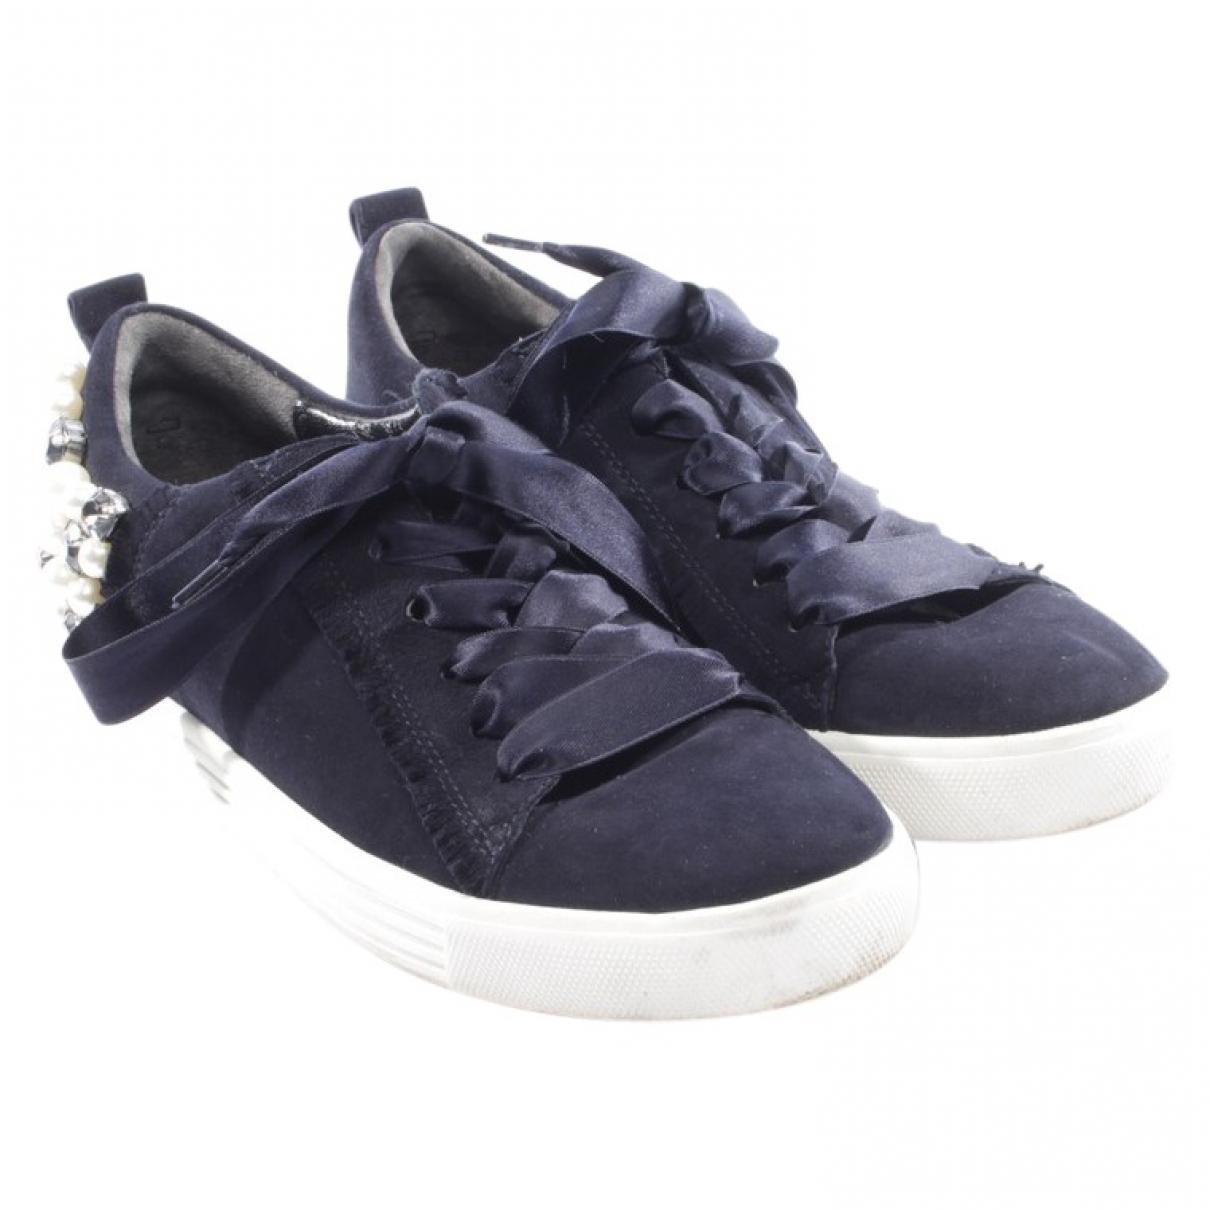 Kennel Und Schmenger \N Blue Leather Flats for Women 39.5 EU